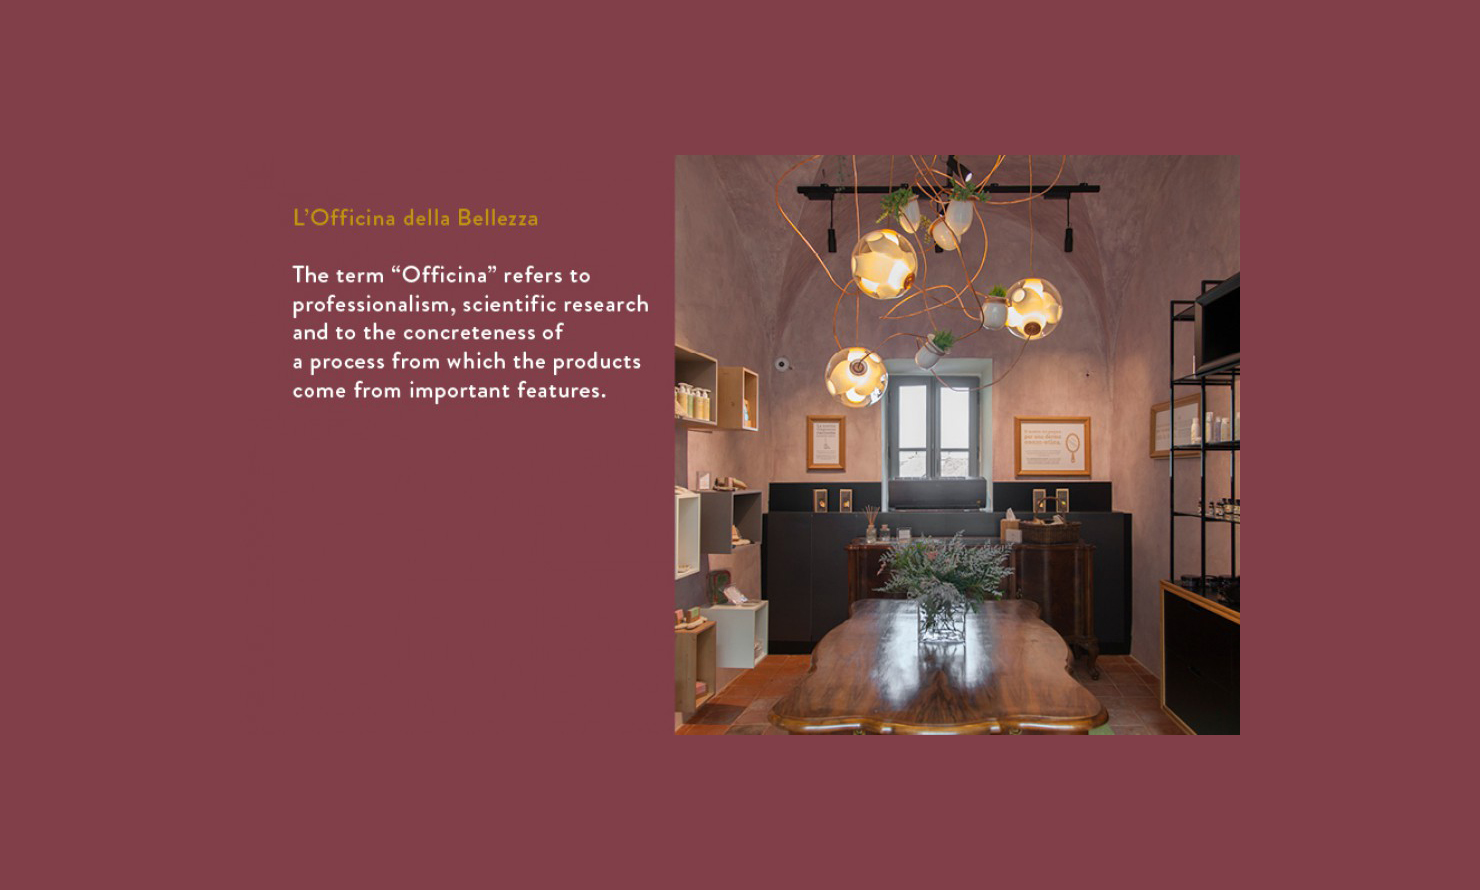 https://kubelibre.com/uploads/Slider-work-tutti-clienti/manital-vistaterra-la-corte-dei-mercanti-le-botteghe-di-vistaterra-12.jpg